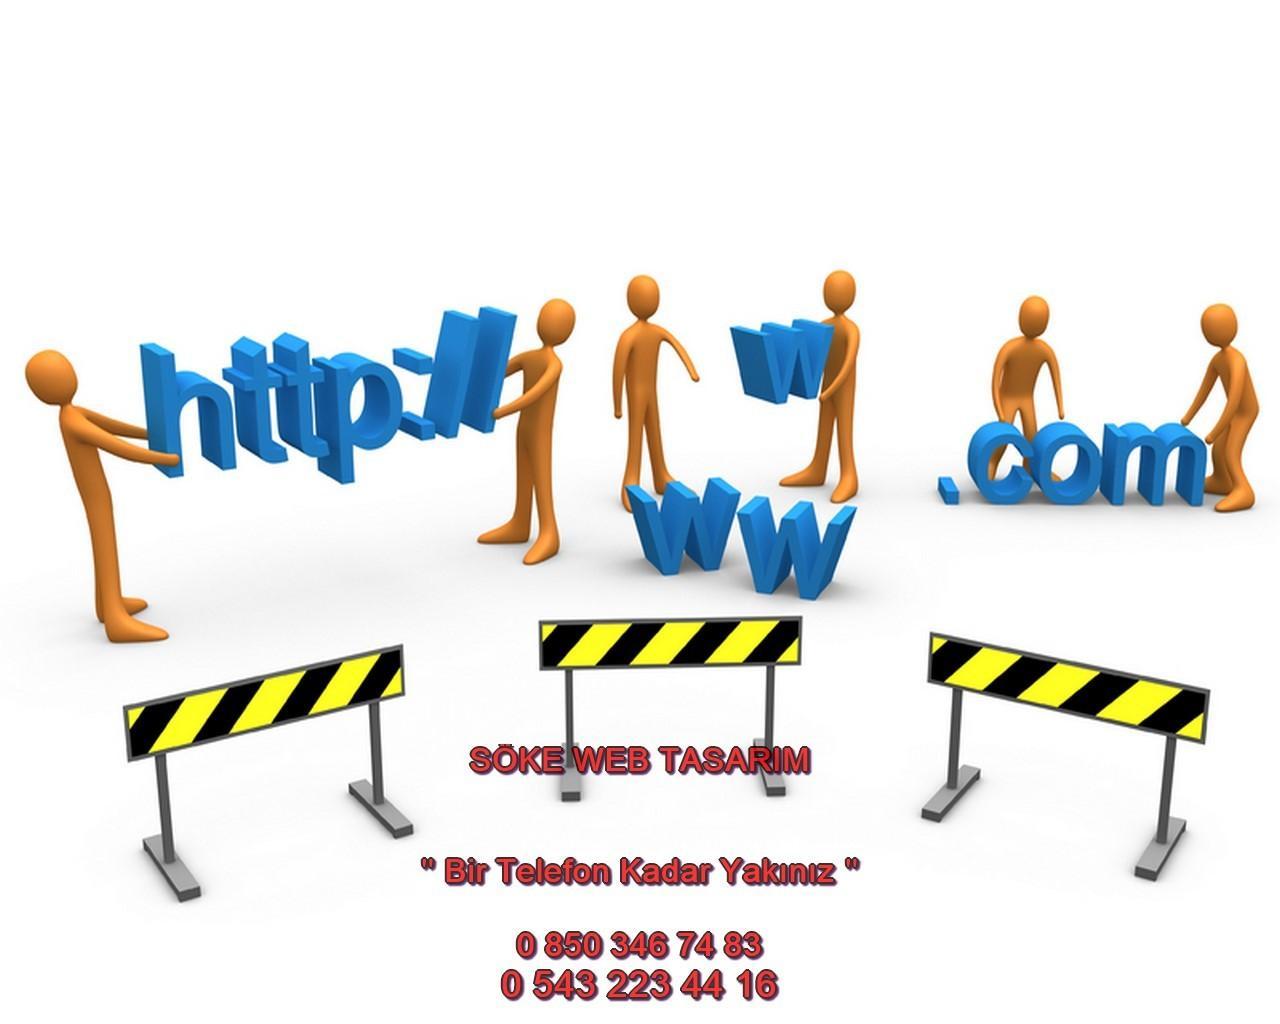 Söke Web Tasarım